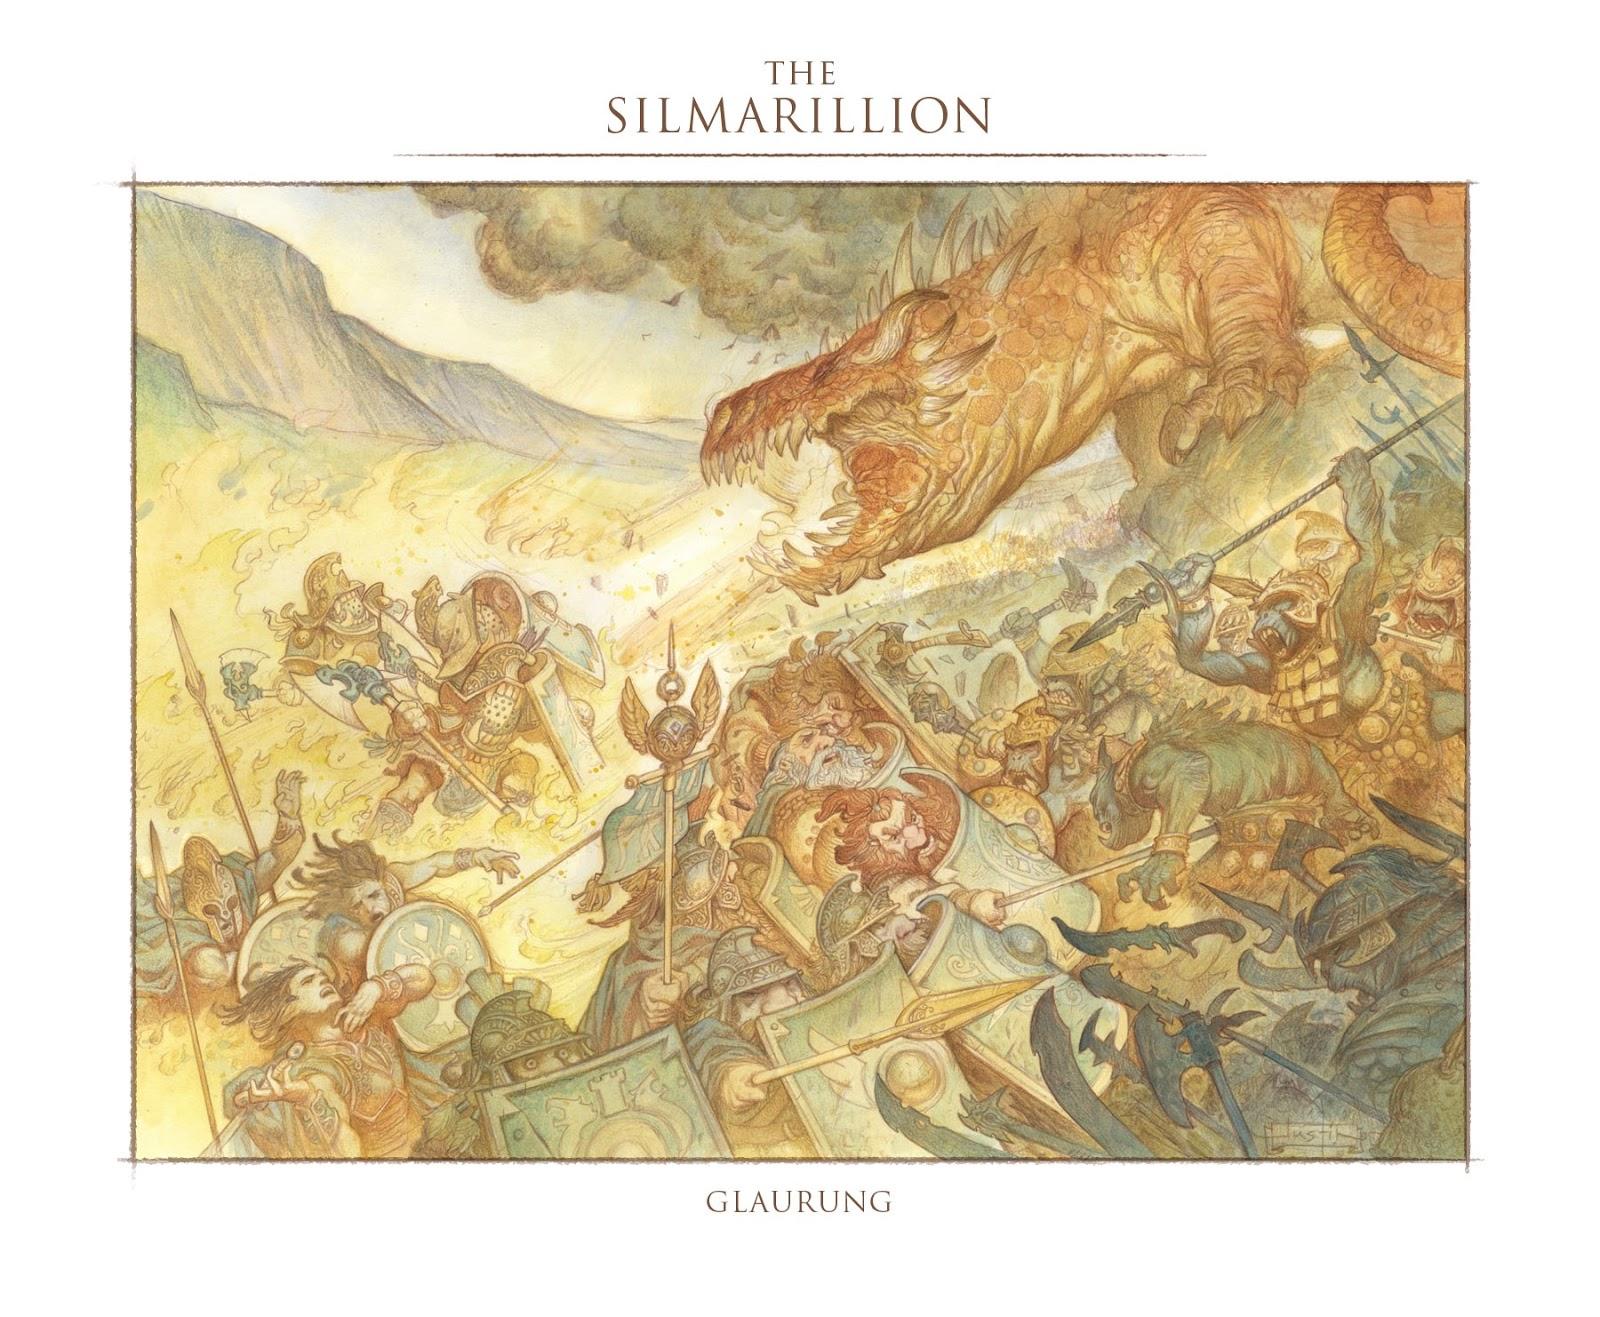 The Silmarillion: Glaurung Final